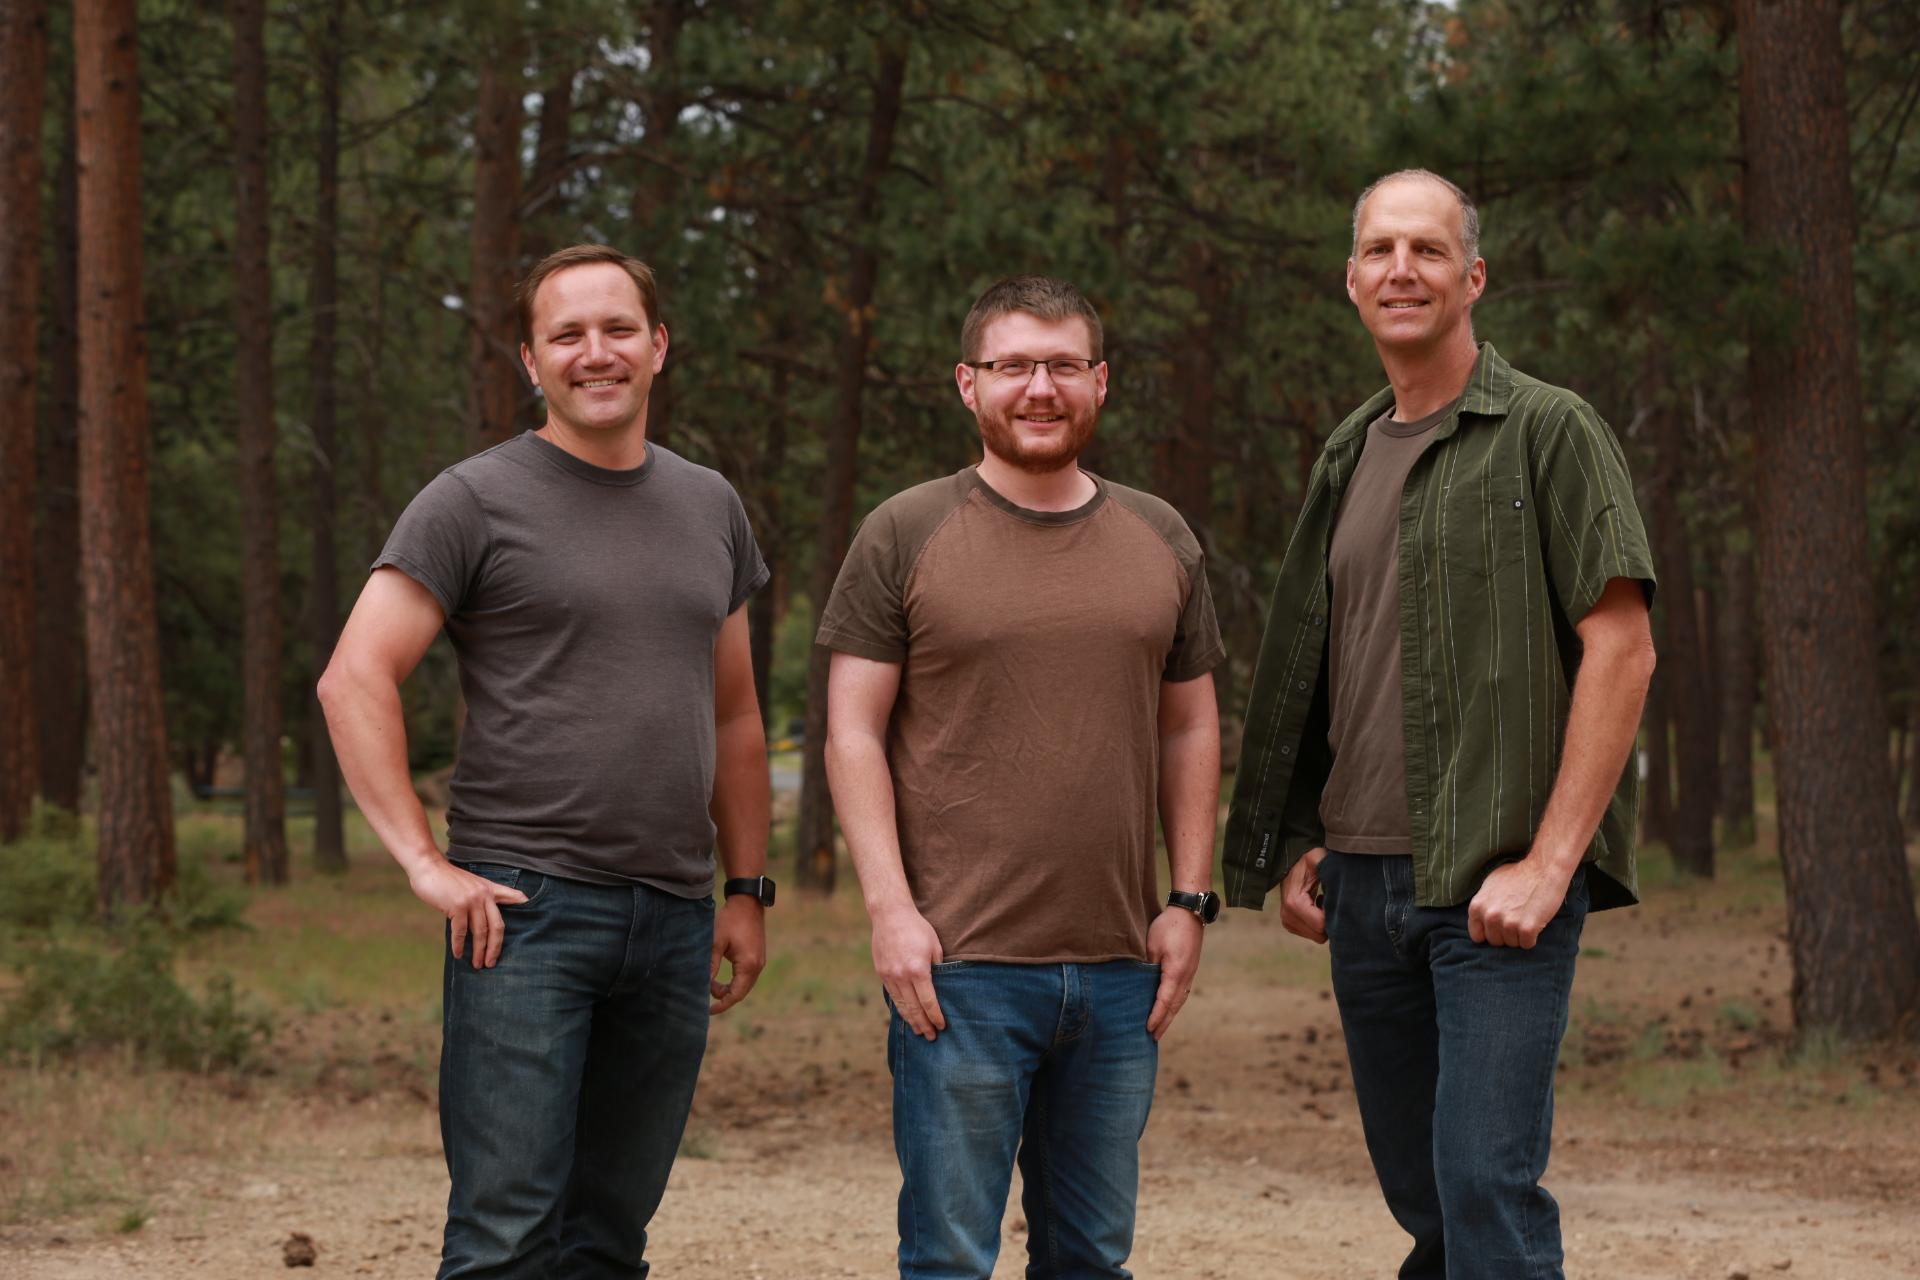 From left: James Gentes, Mark Silliman, and Robert Kieffer